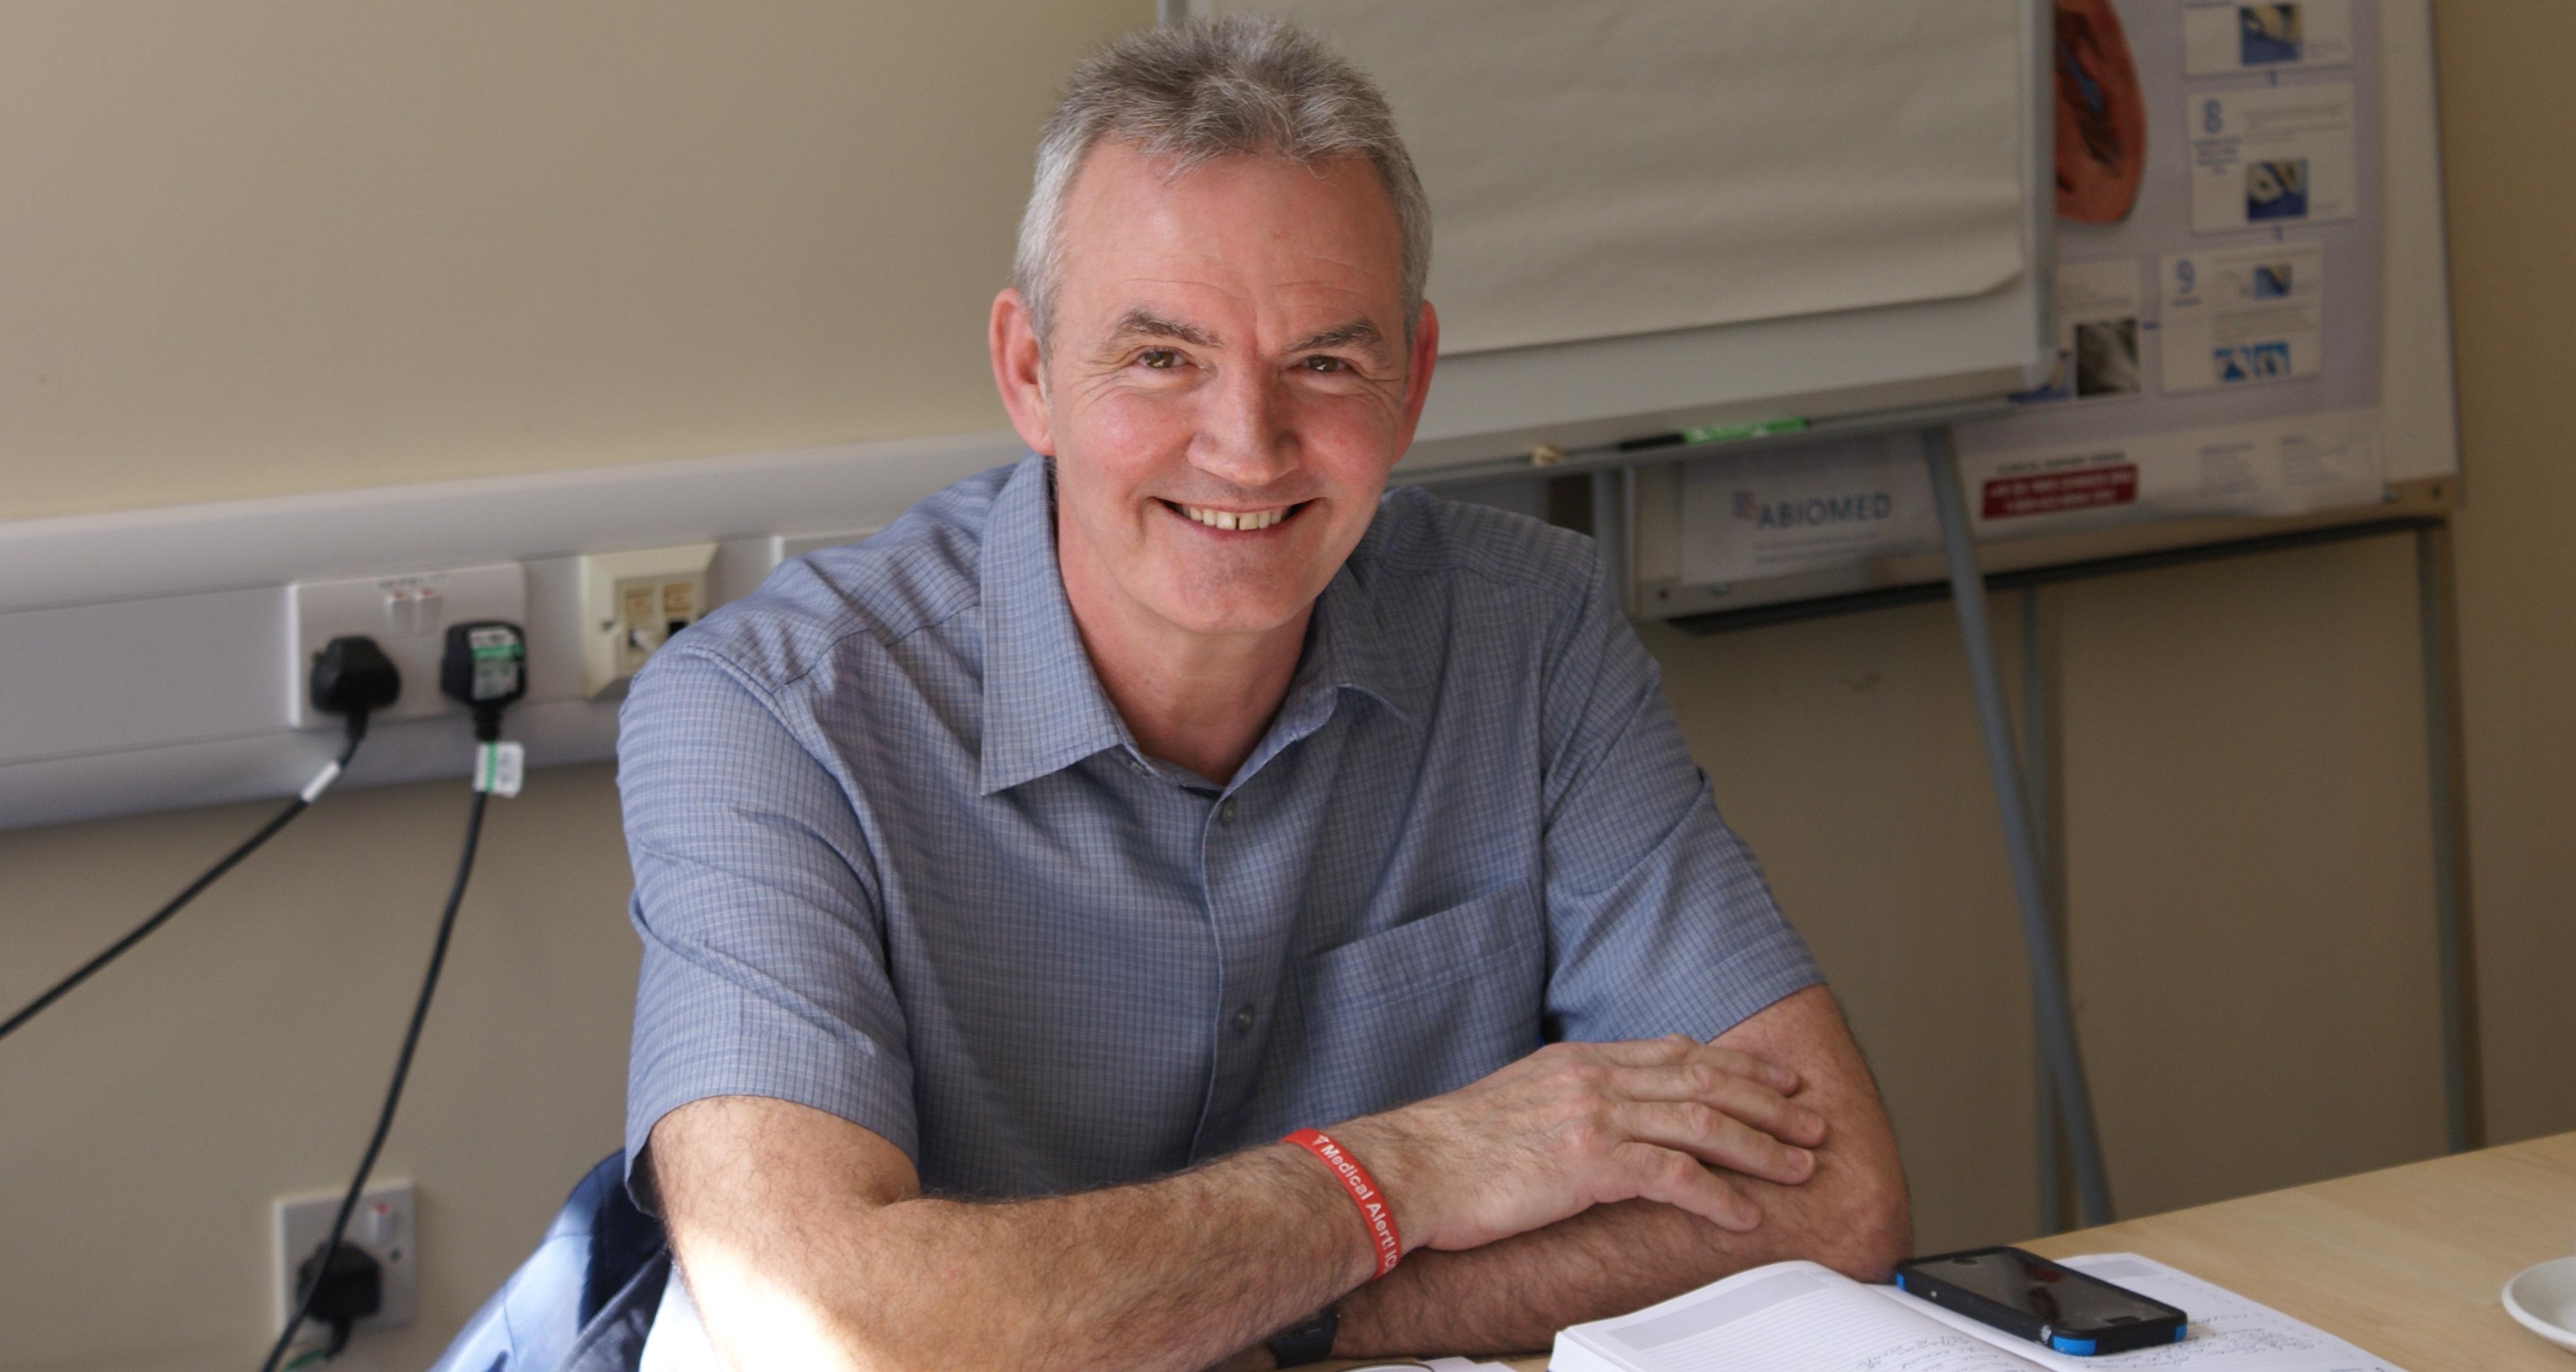 Paul Davis, patient of Wythenshawe Hospital, headshot image